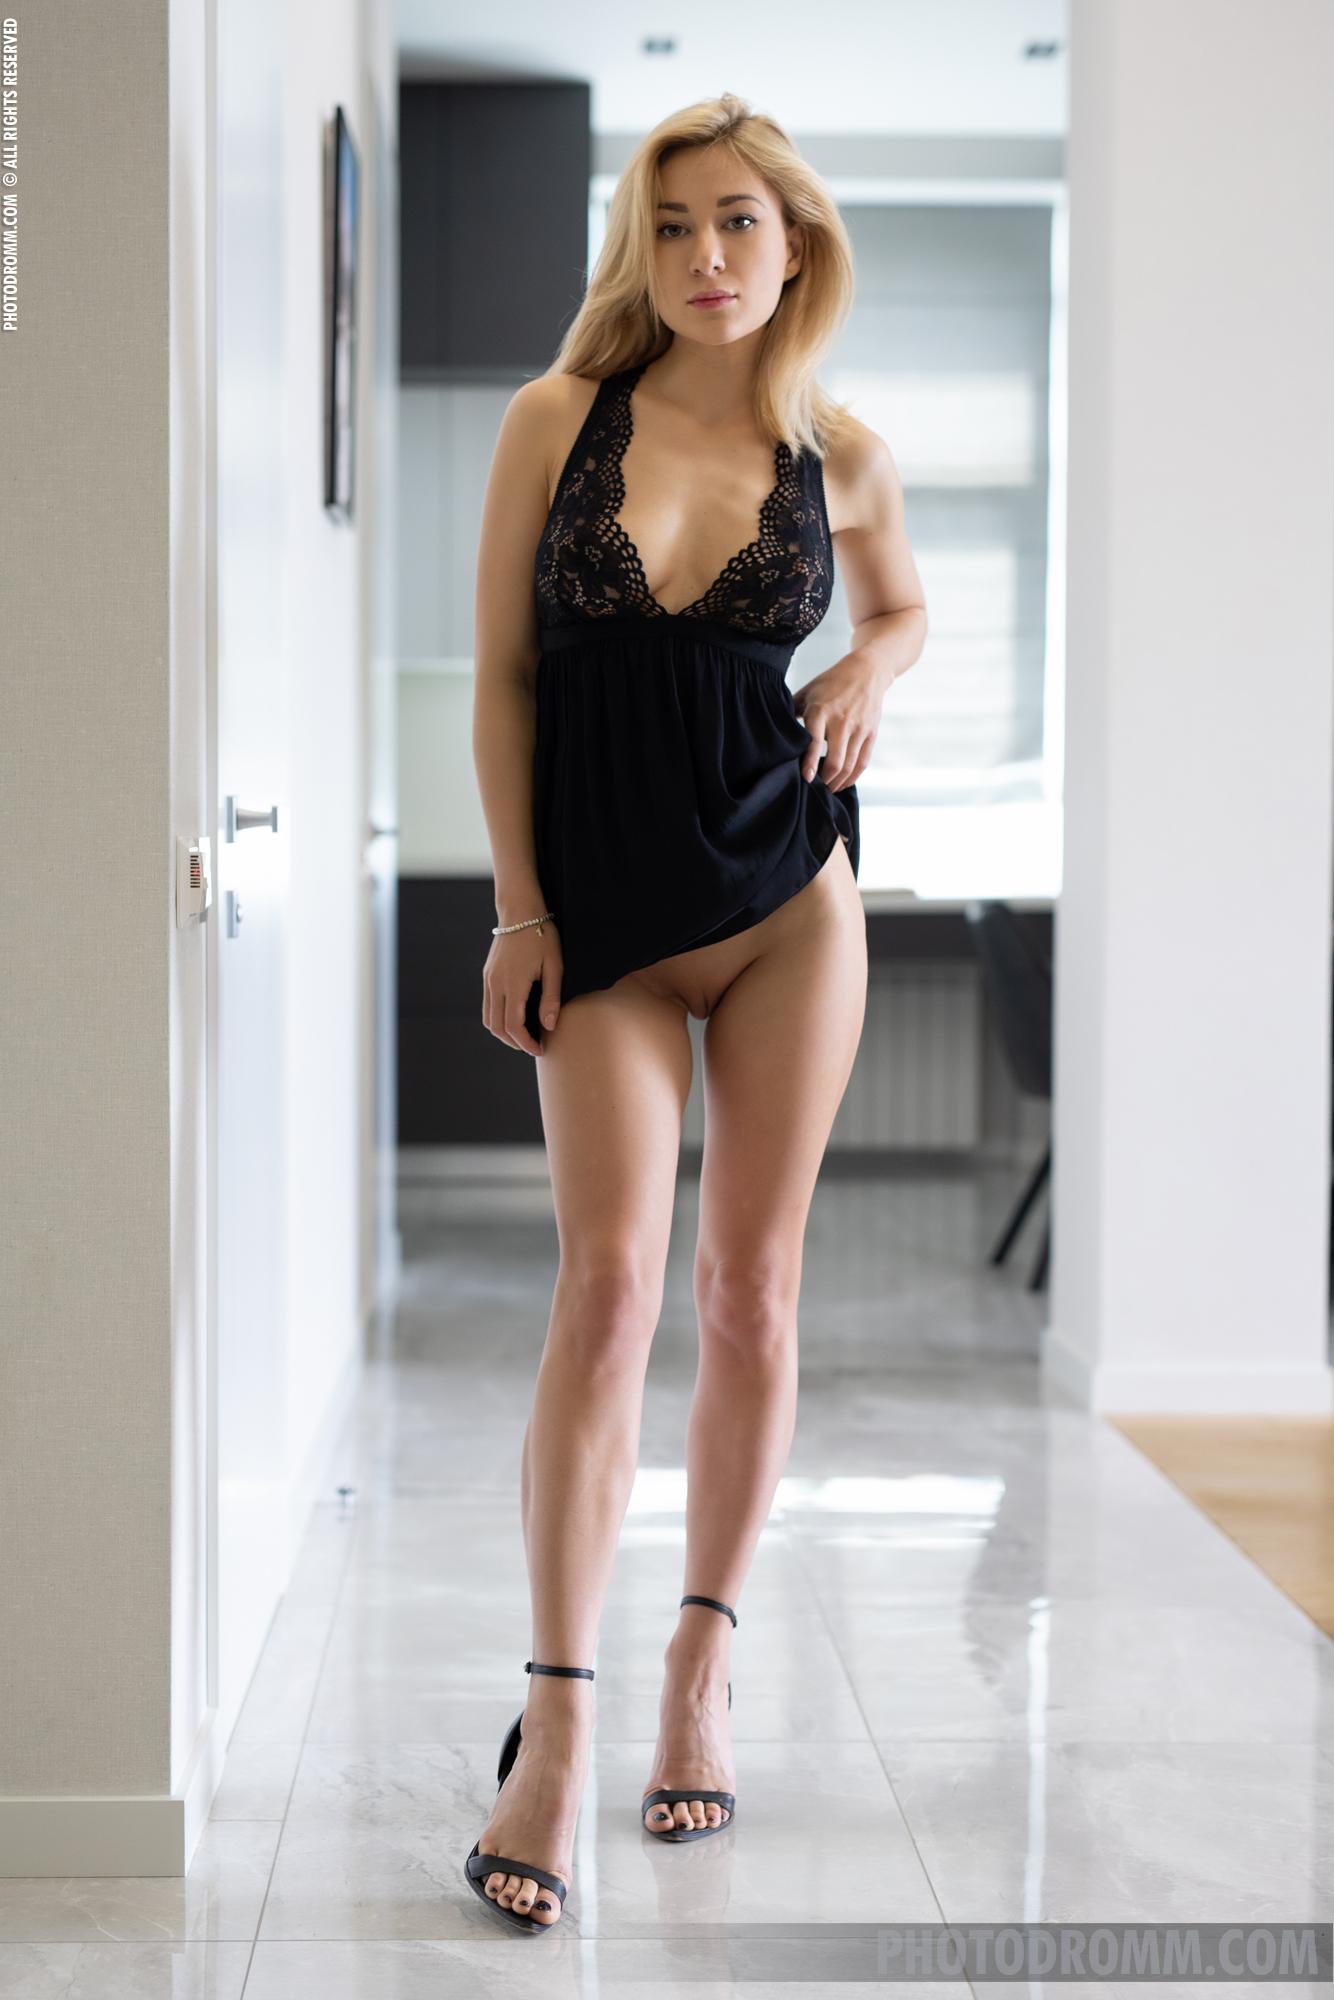 Darya Big Tits in Little Black Dress for Photodromm